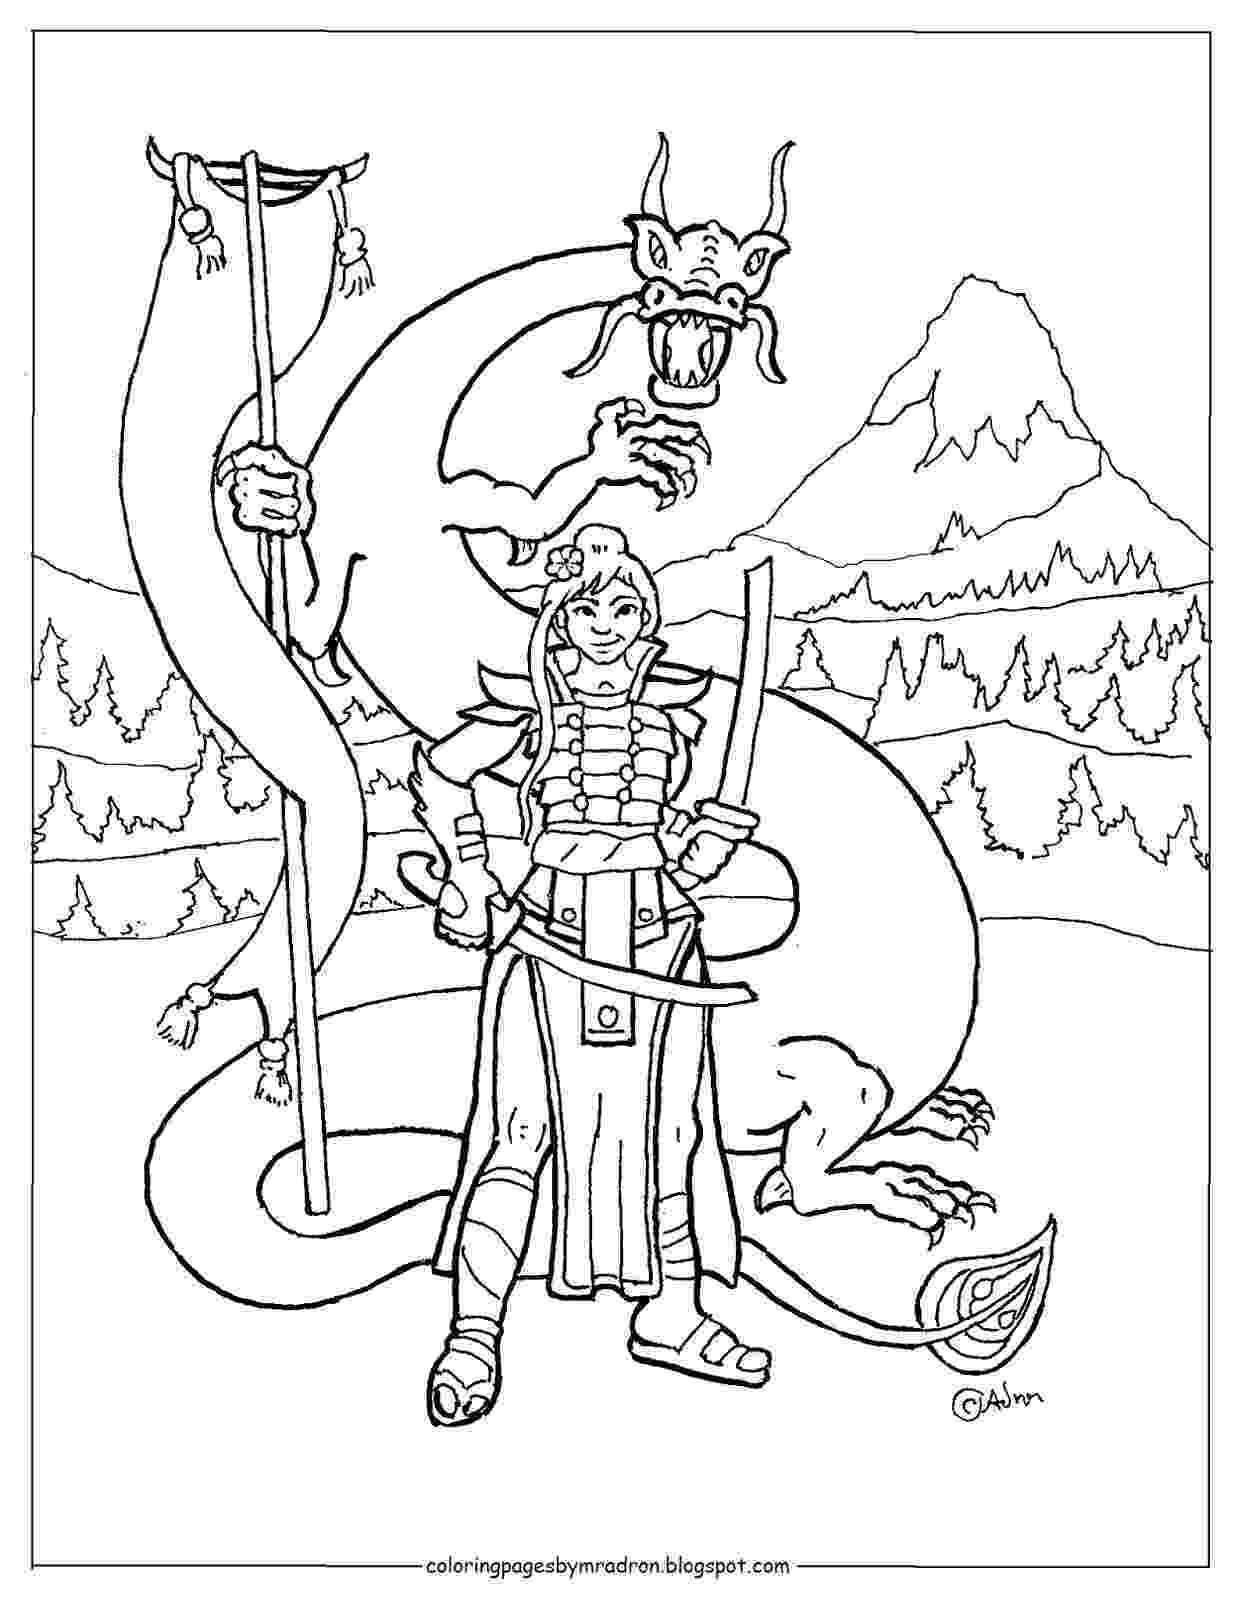 ninja coloring pages lego ninjago green ninja coloring page free printable ninja coloring pages